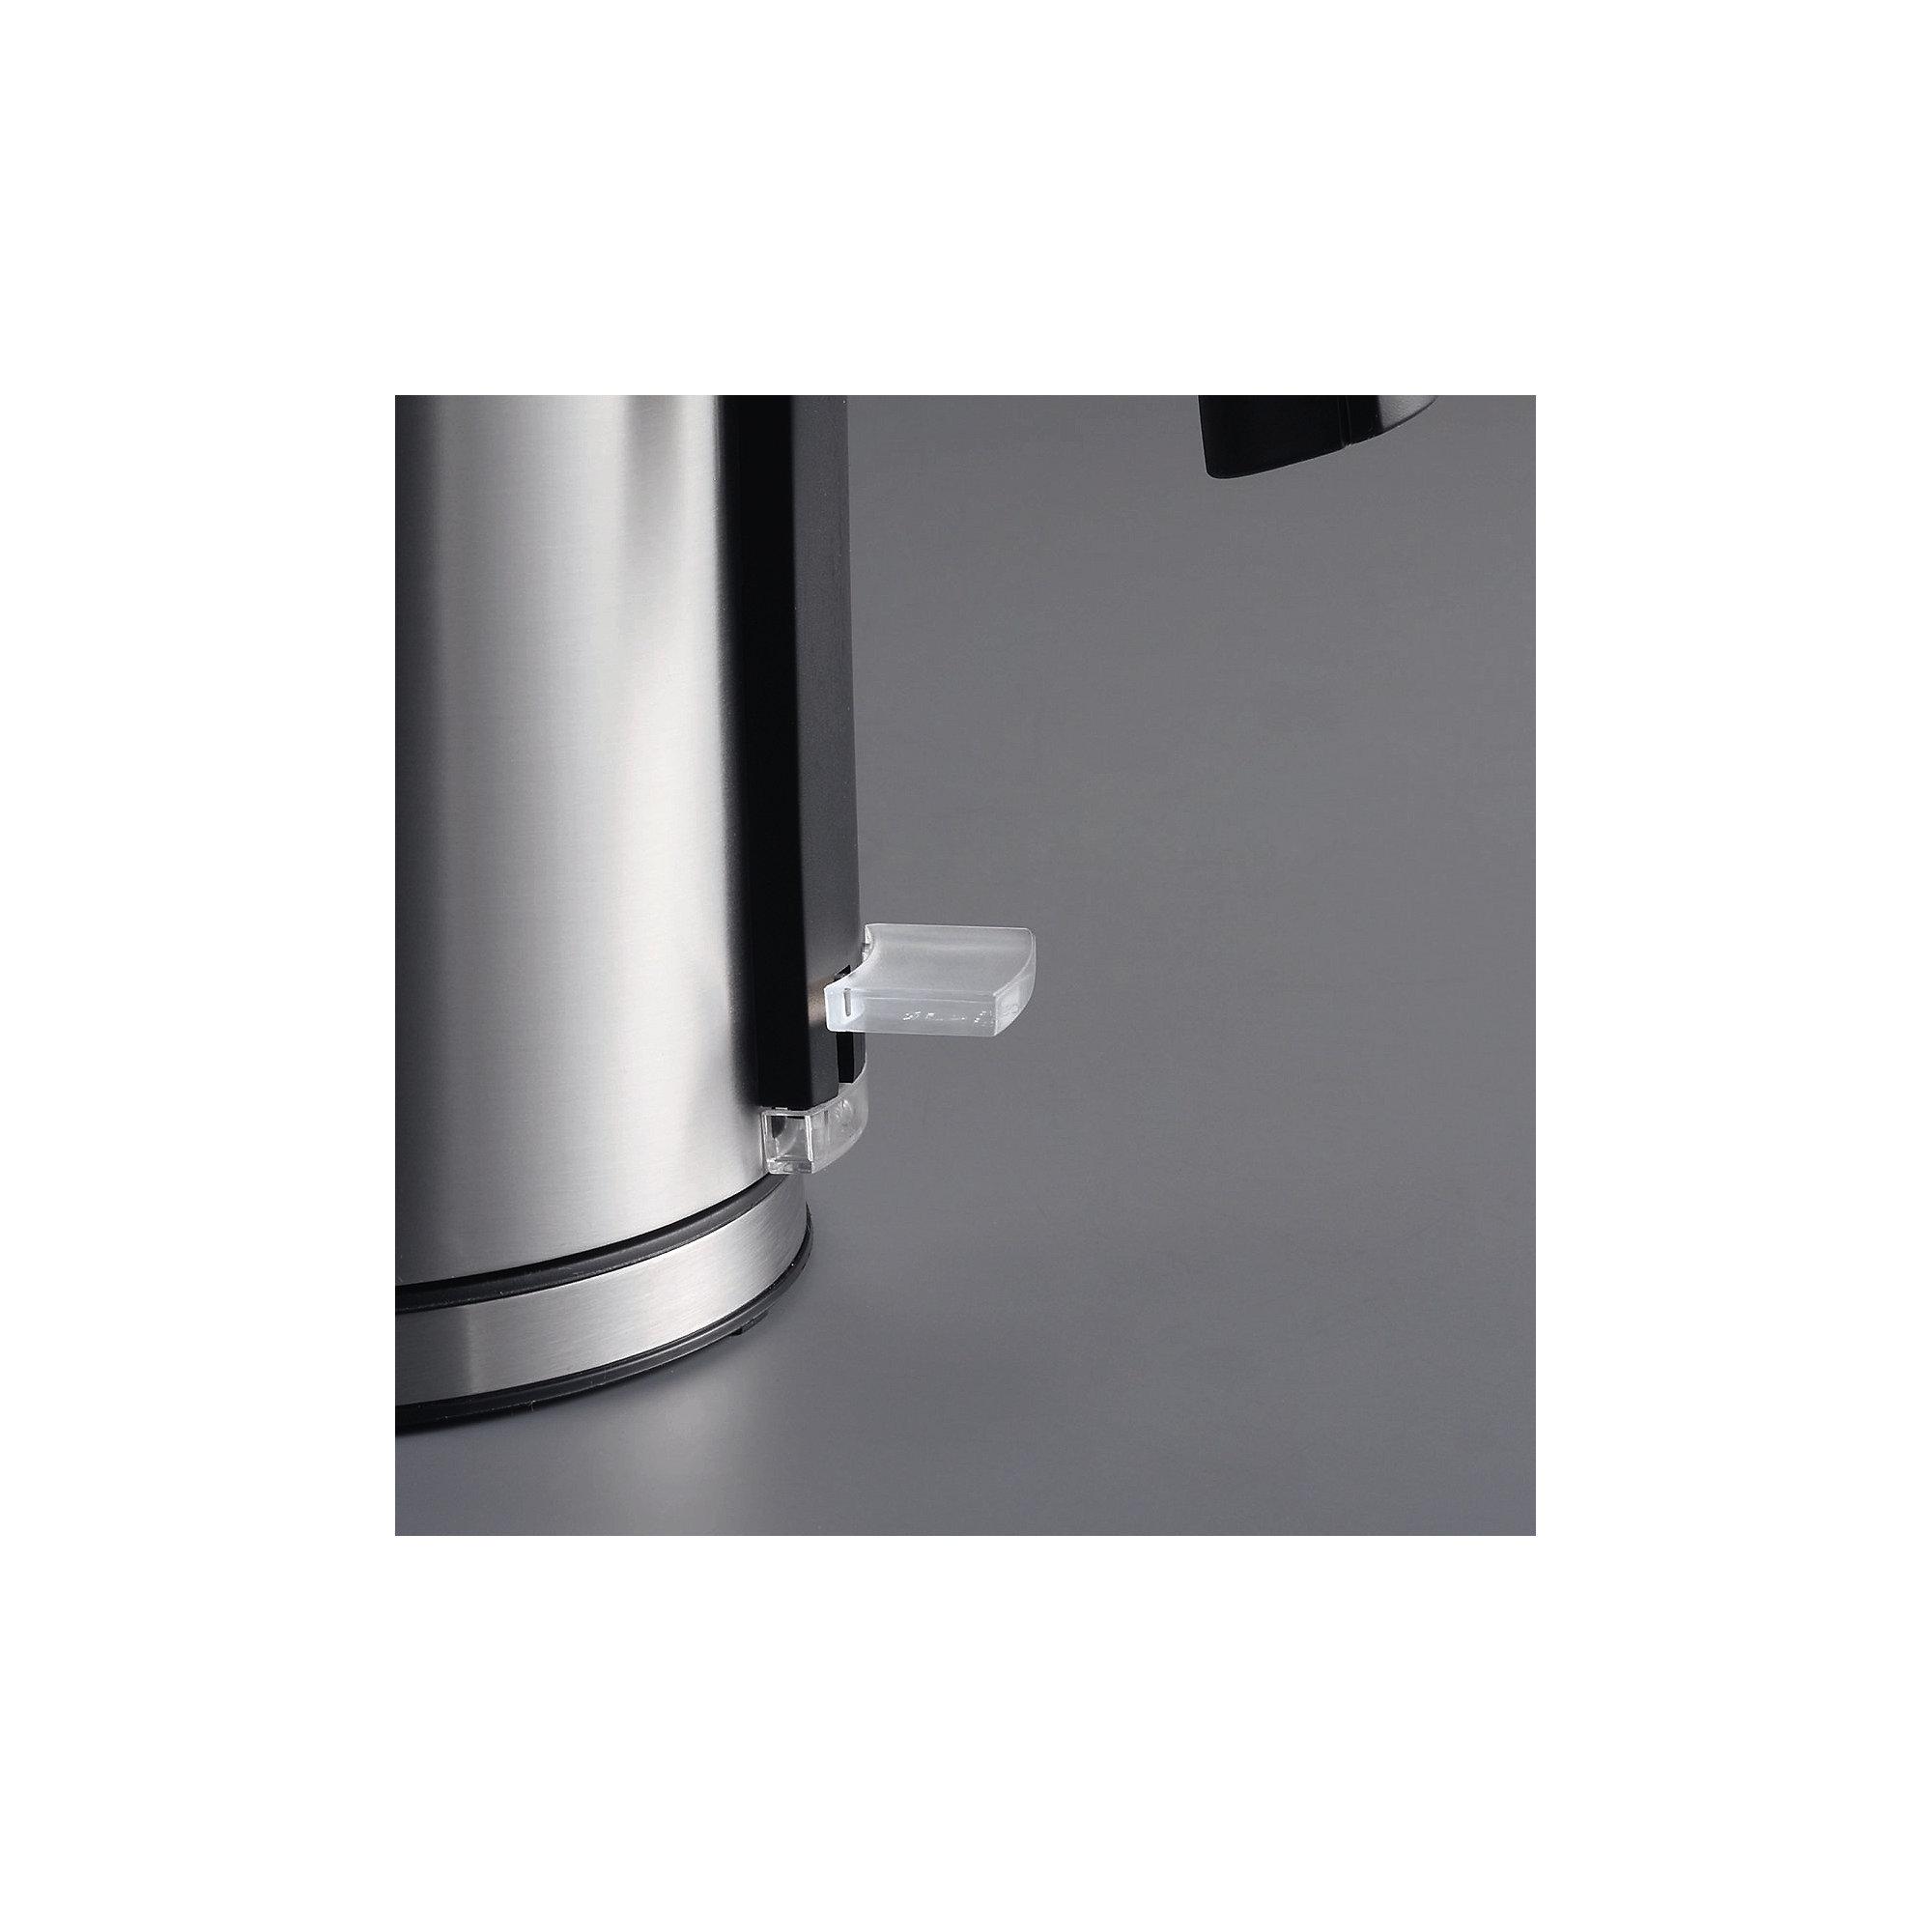 cloer 4909 wasserkocher 1 2 liter edelstahl cyberport. Black Bedroom Furniture Sets. Home Design Ideas